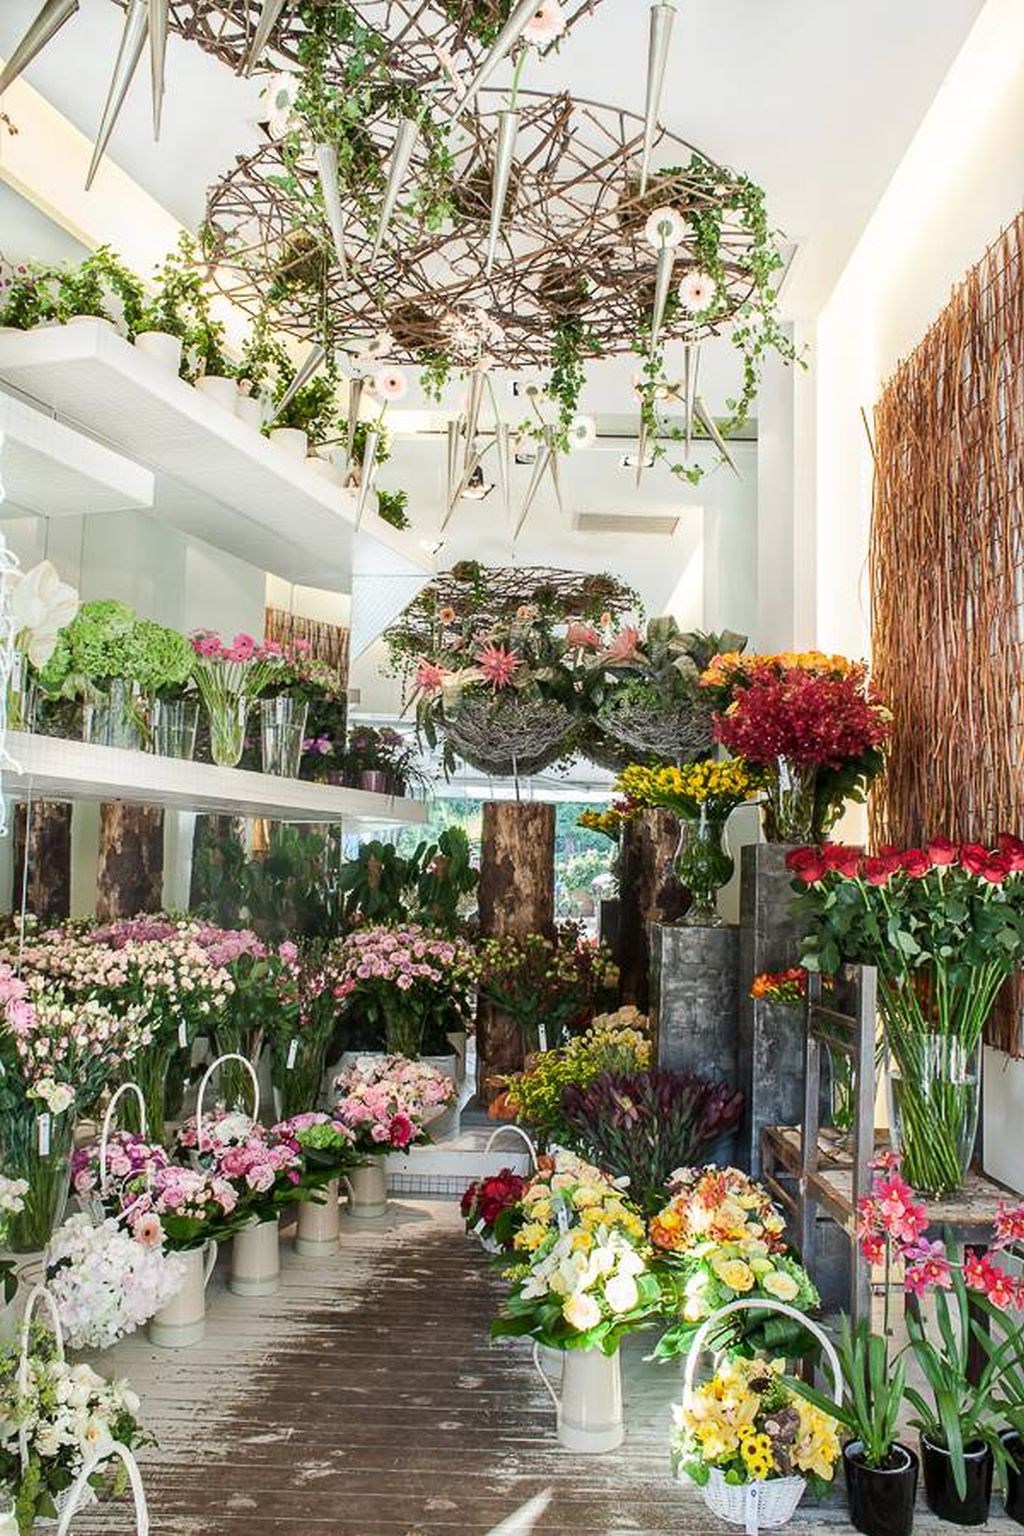 Florarie minunat amenajata autorii sunt arhitectul for Flower shop design layouts